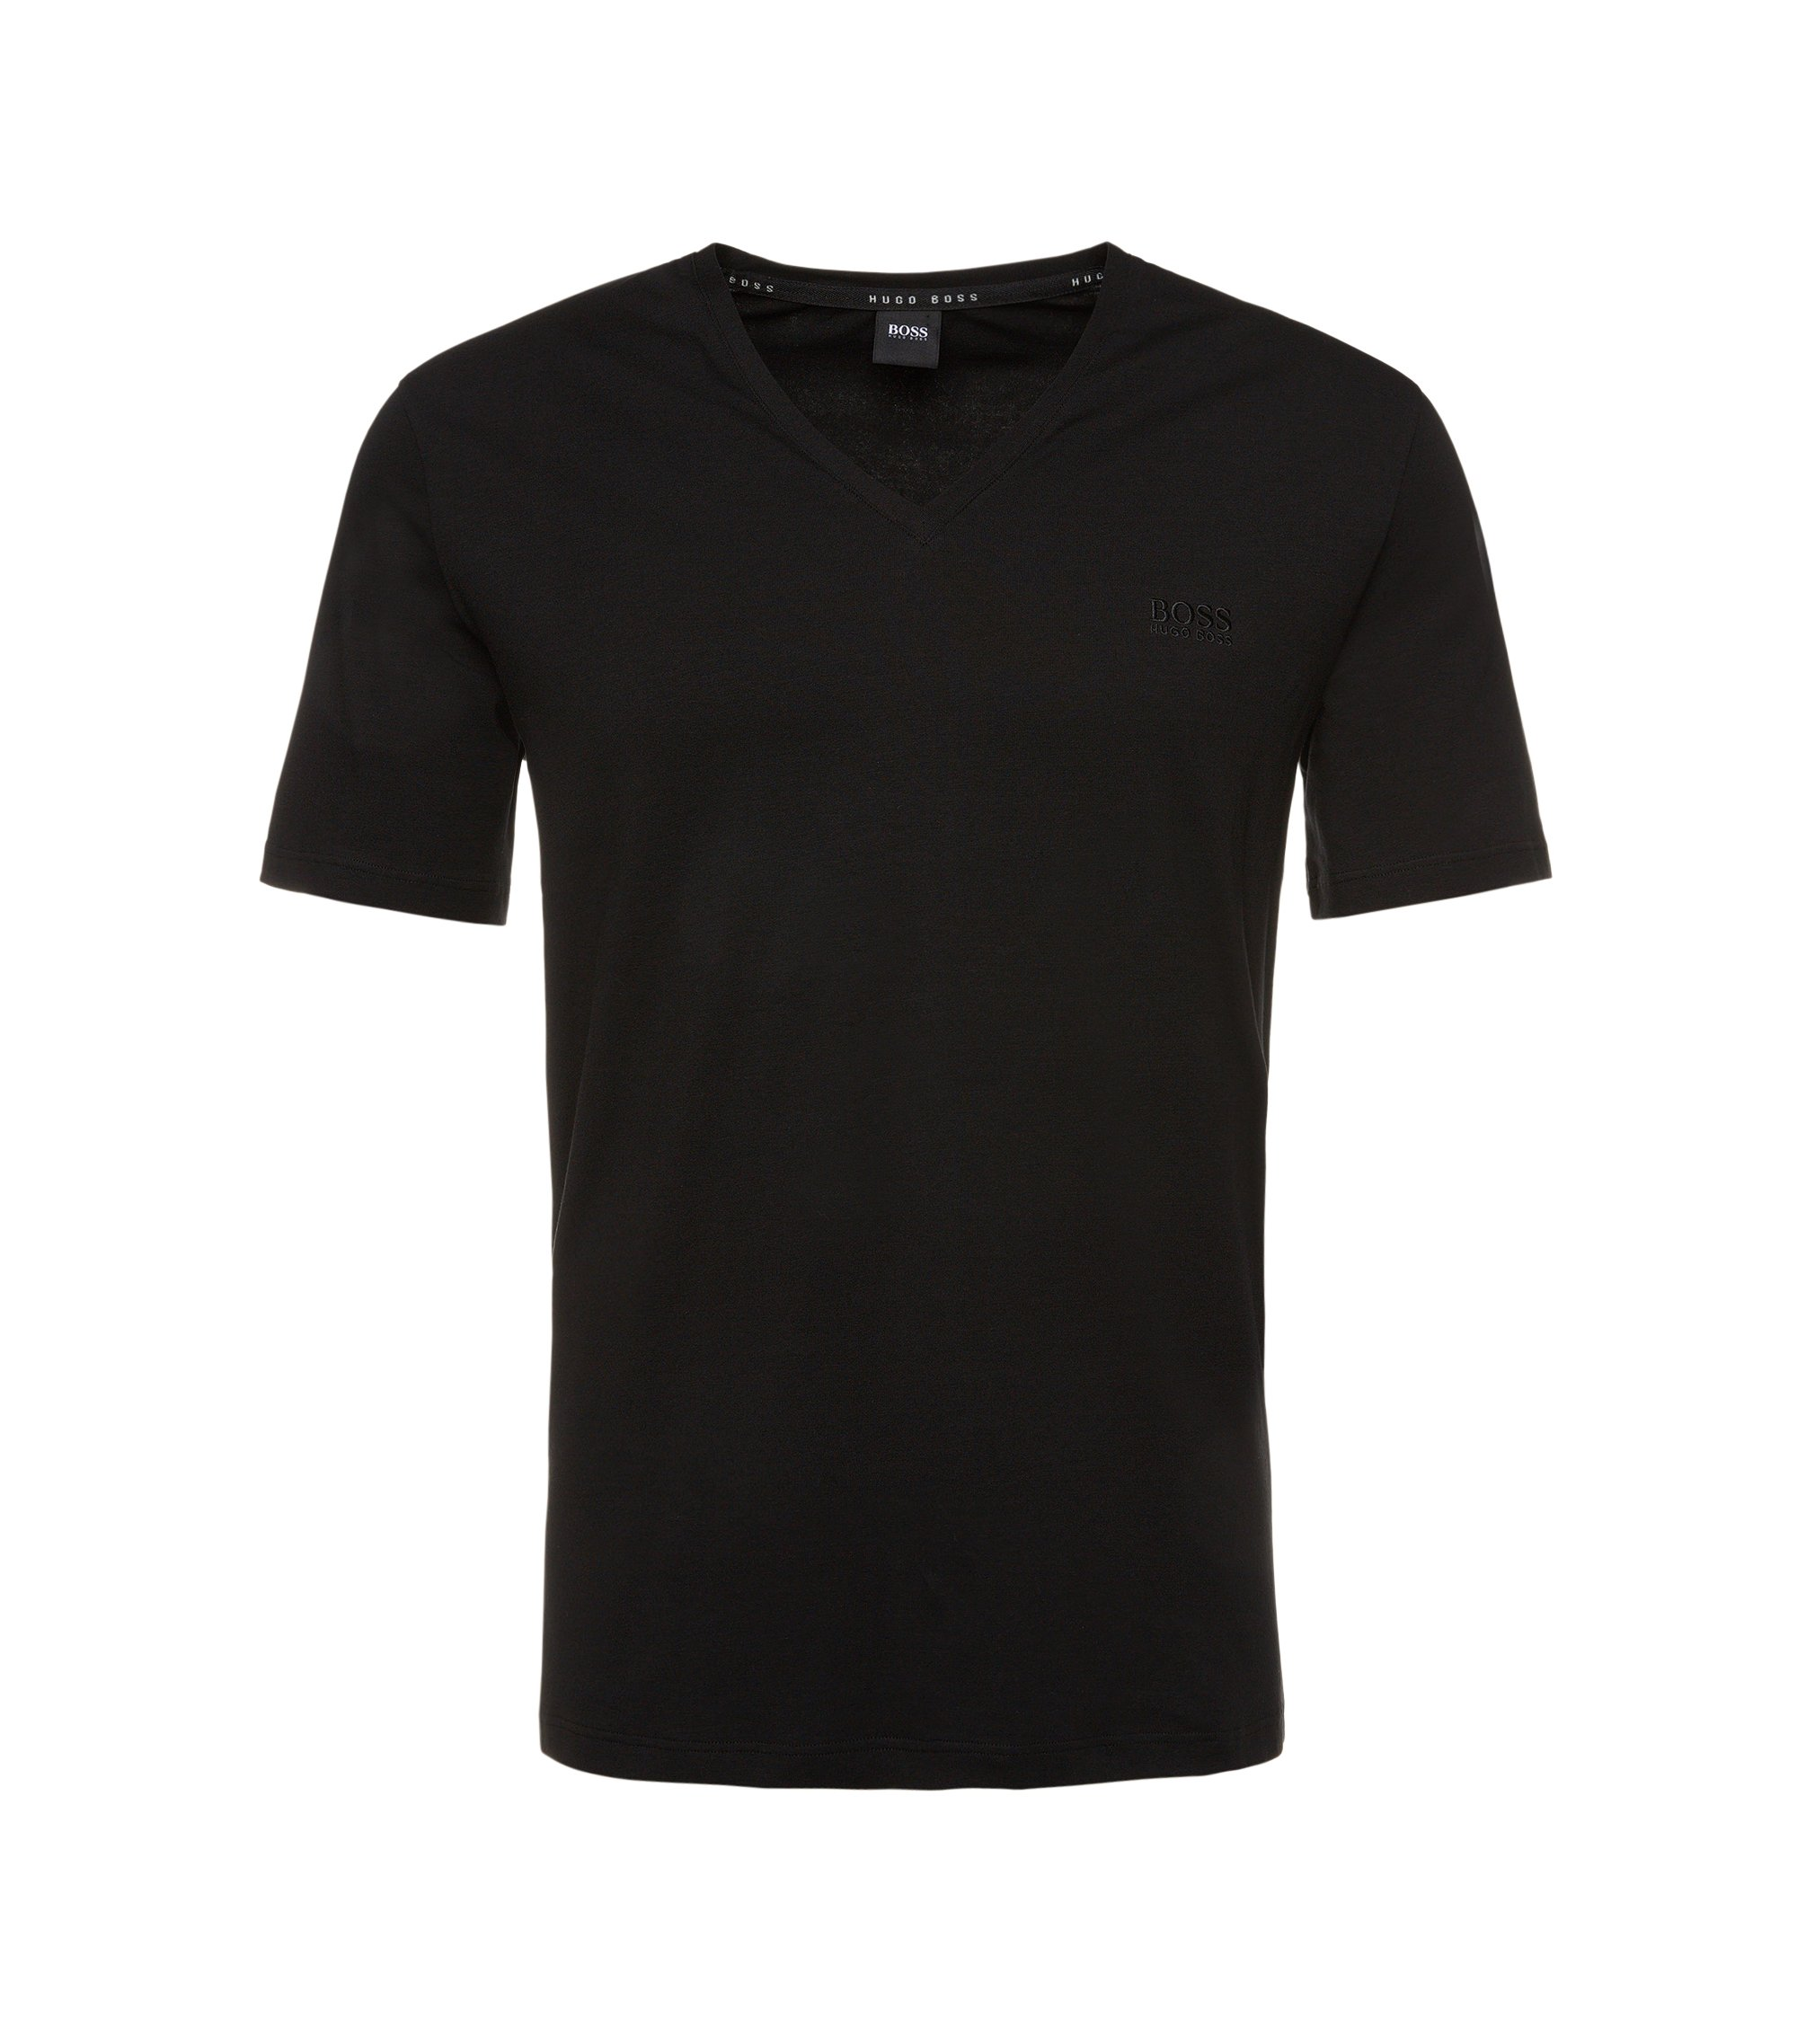 Regular Fit T-Shirt aus elastischem Baumwoll-Mix: 'Shirt VN' , Schwarz